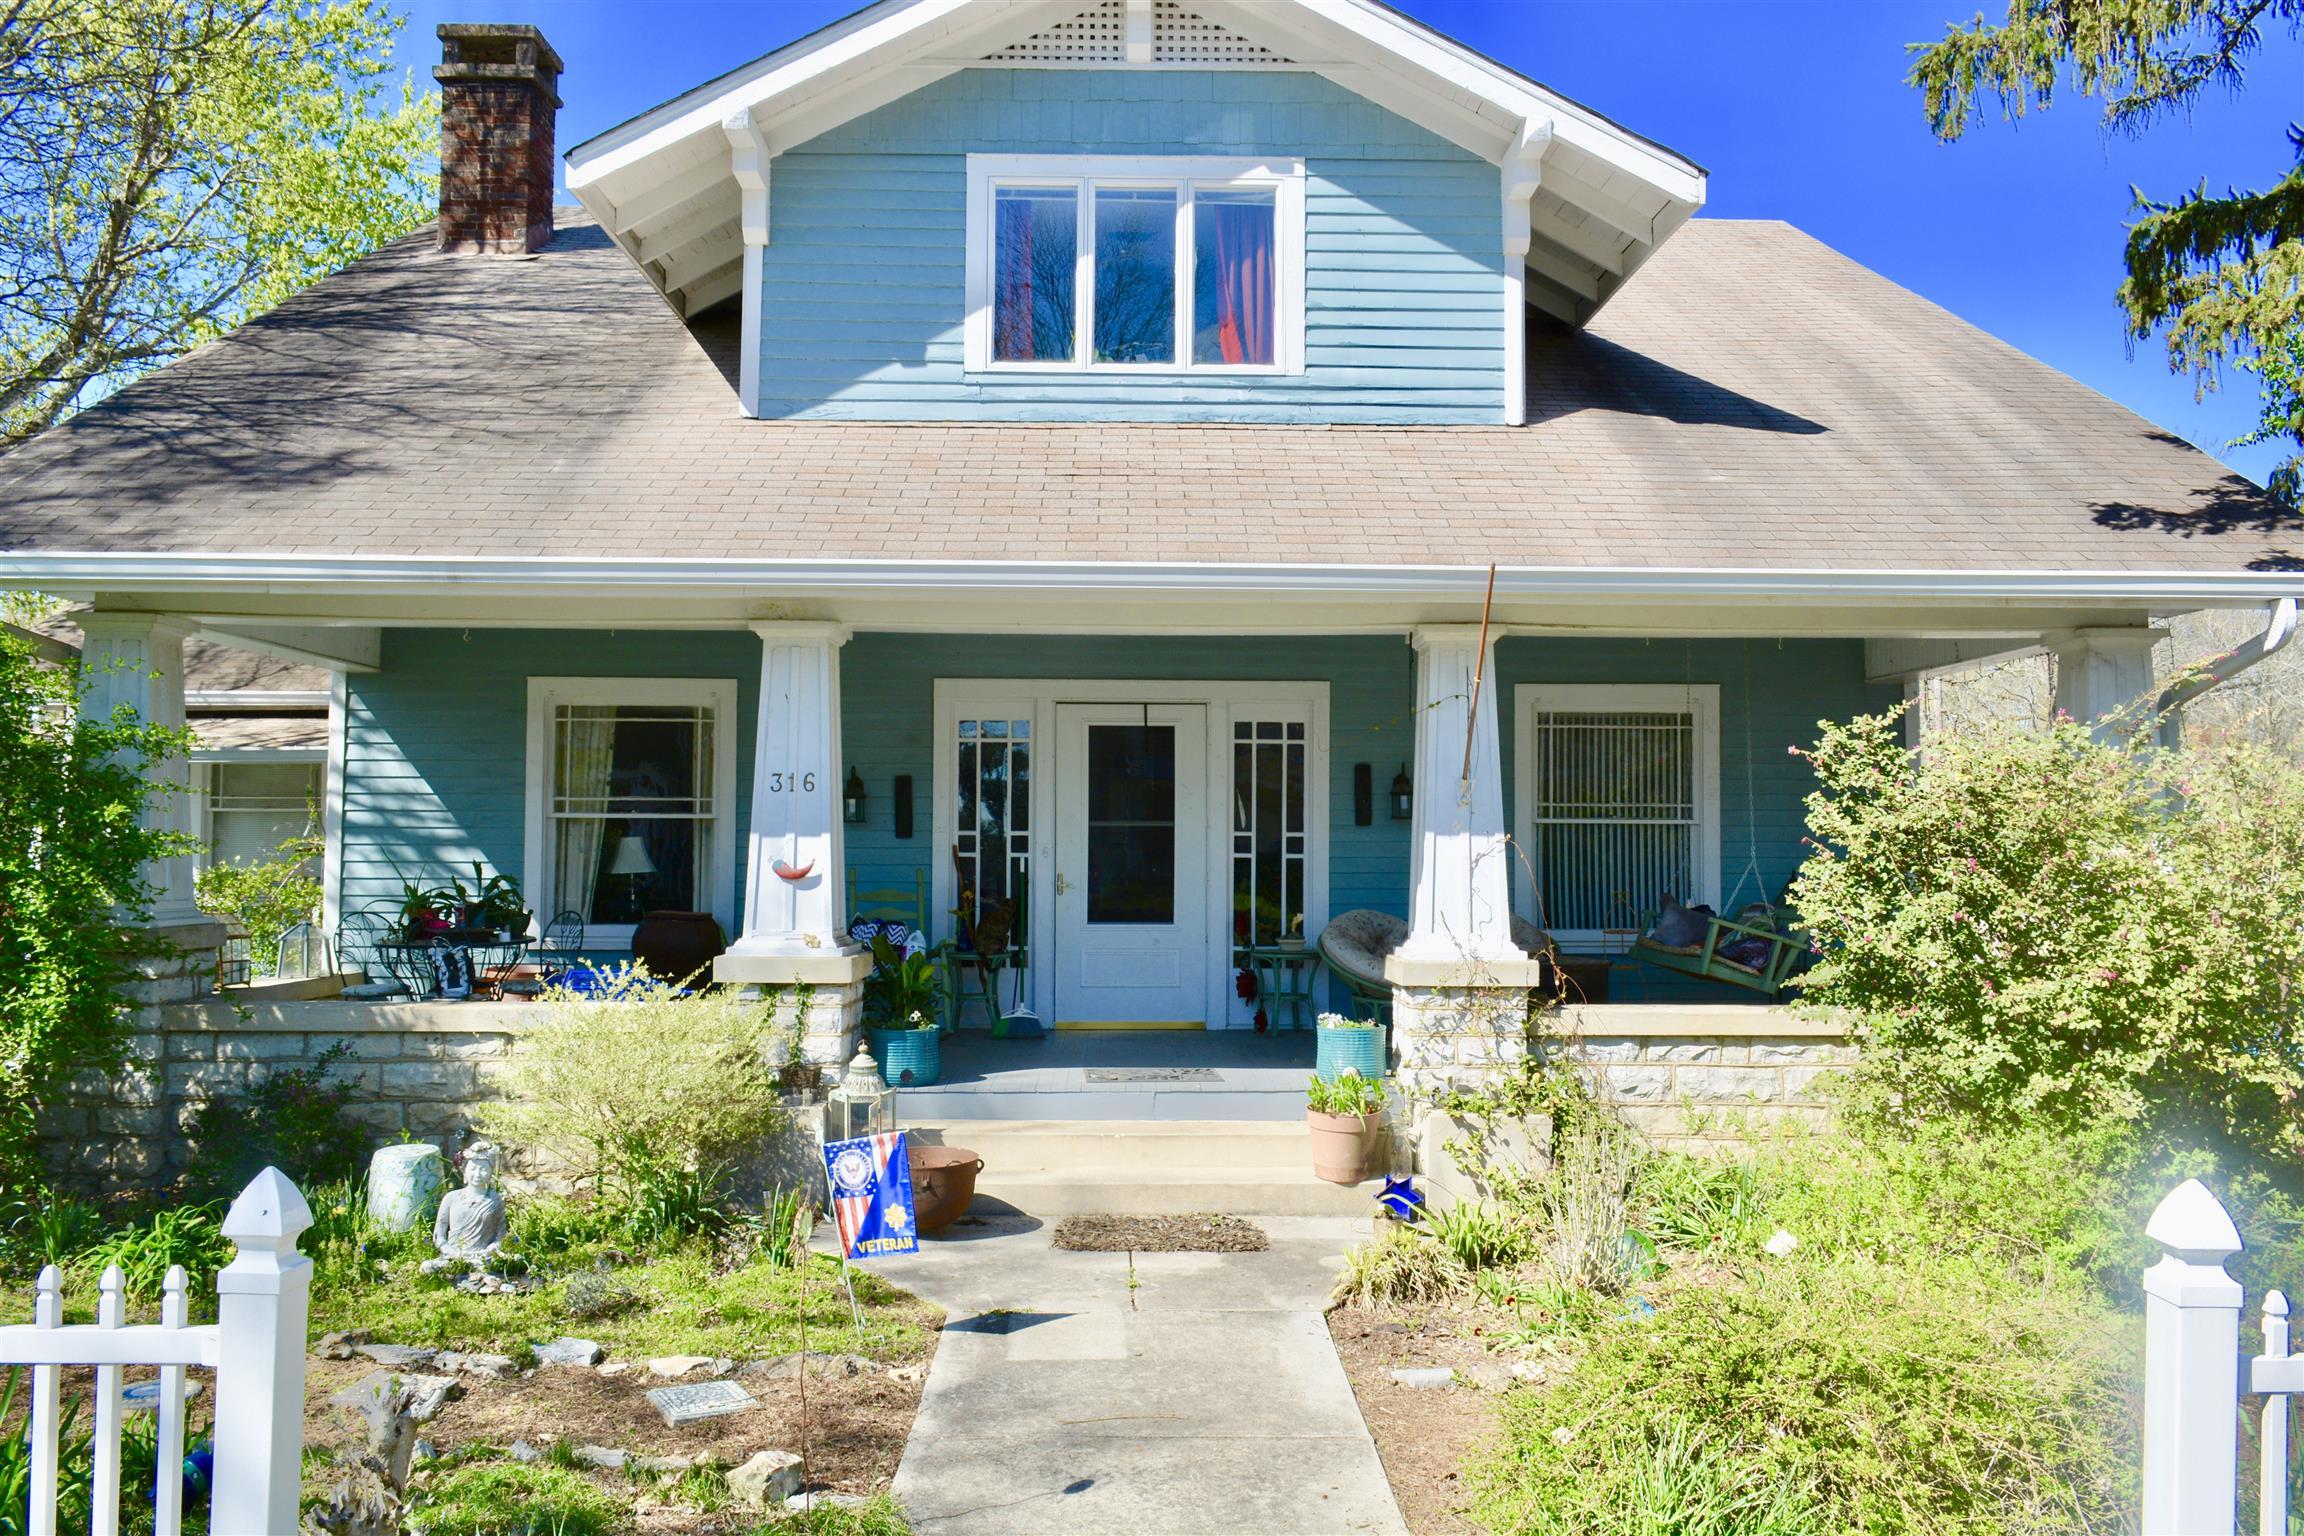 316 College St E, Fayetteville, TN 37334 - Fayetteville, TN real estate listing